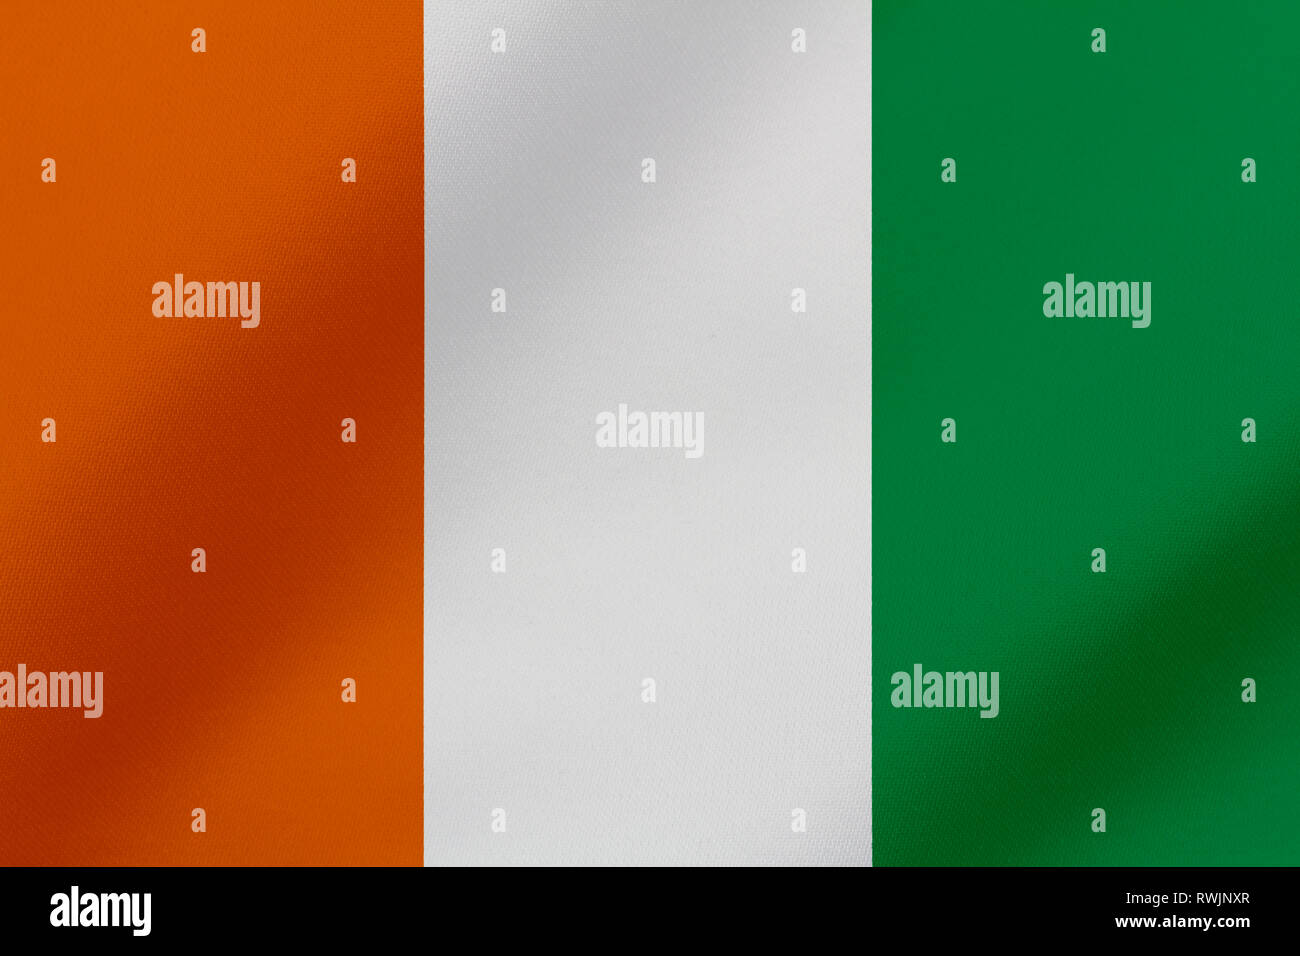 Beautiful Cote d'Ivoire waving flag illustration. - Stock Image